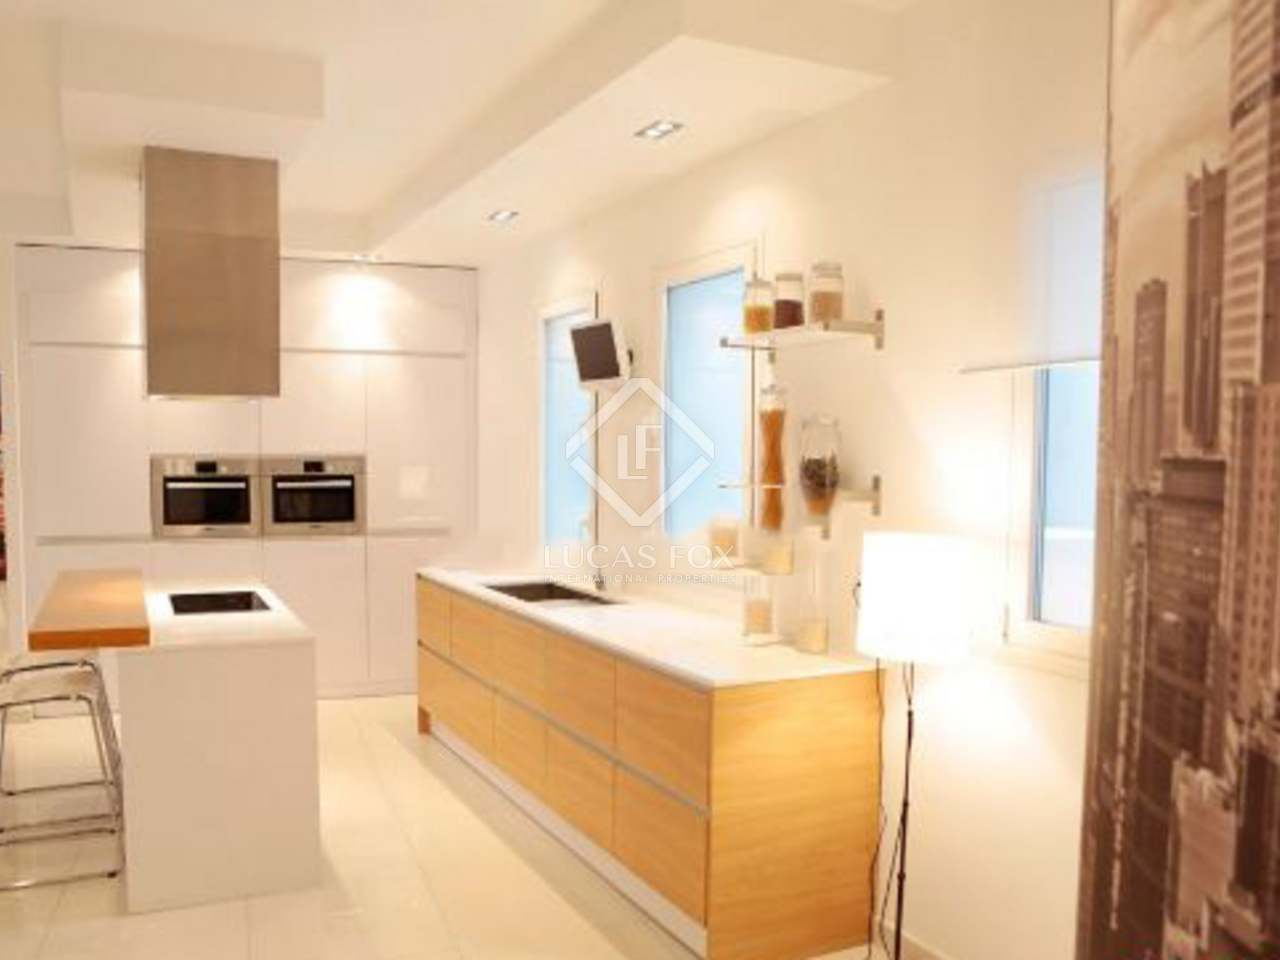 Excellent apartment for sale next to retiro park madrid for Bathrooms in retiro park